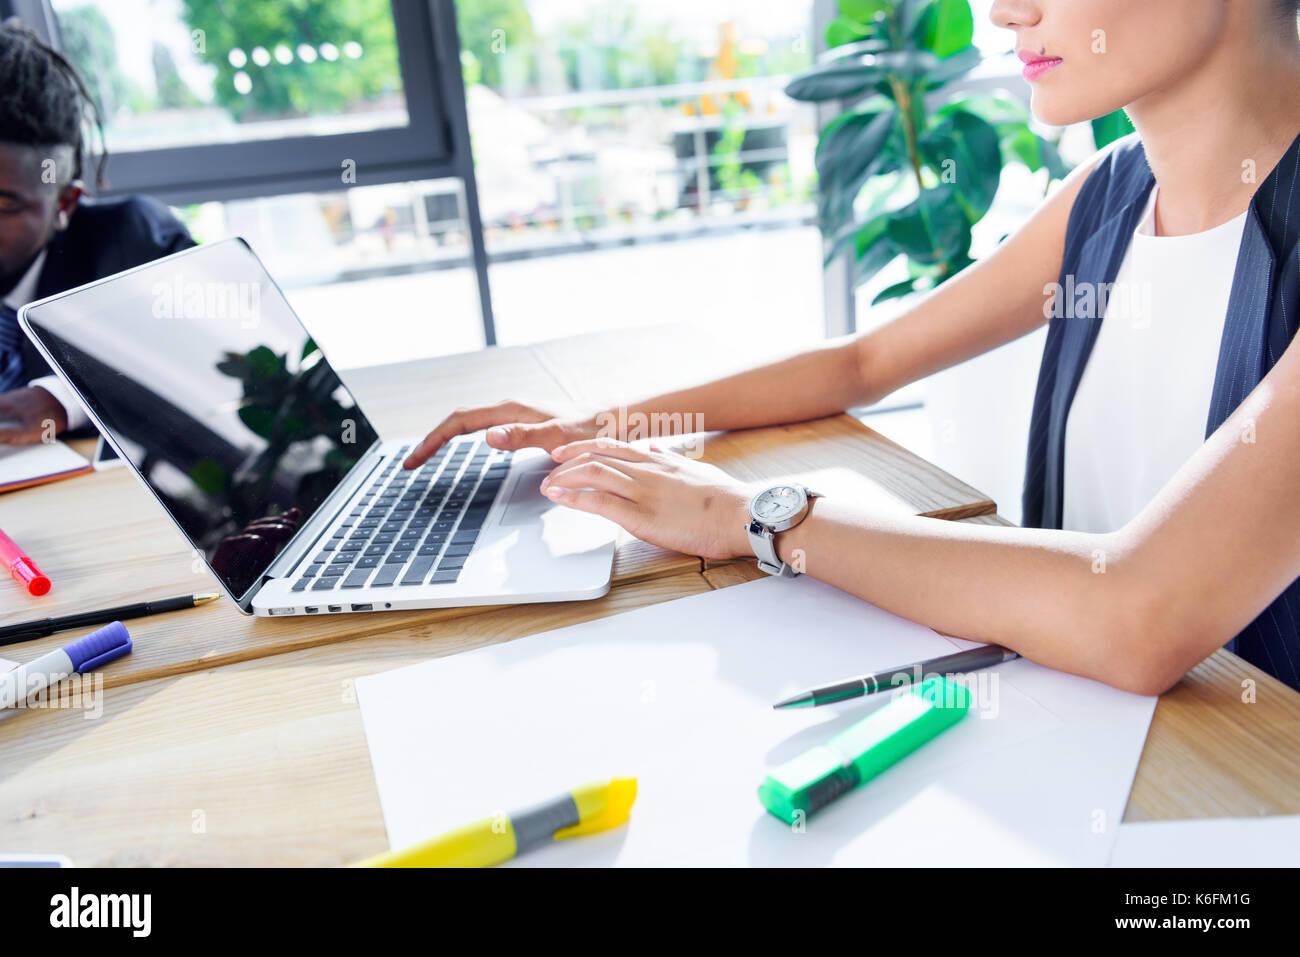 Businesswoman using laptop Photo Stock